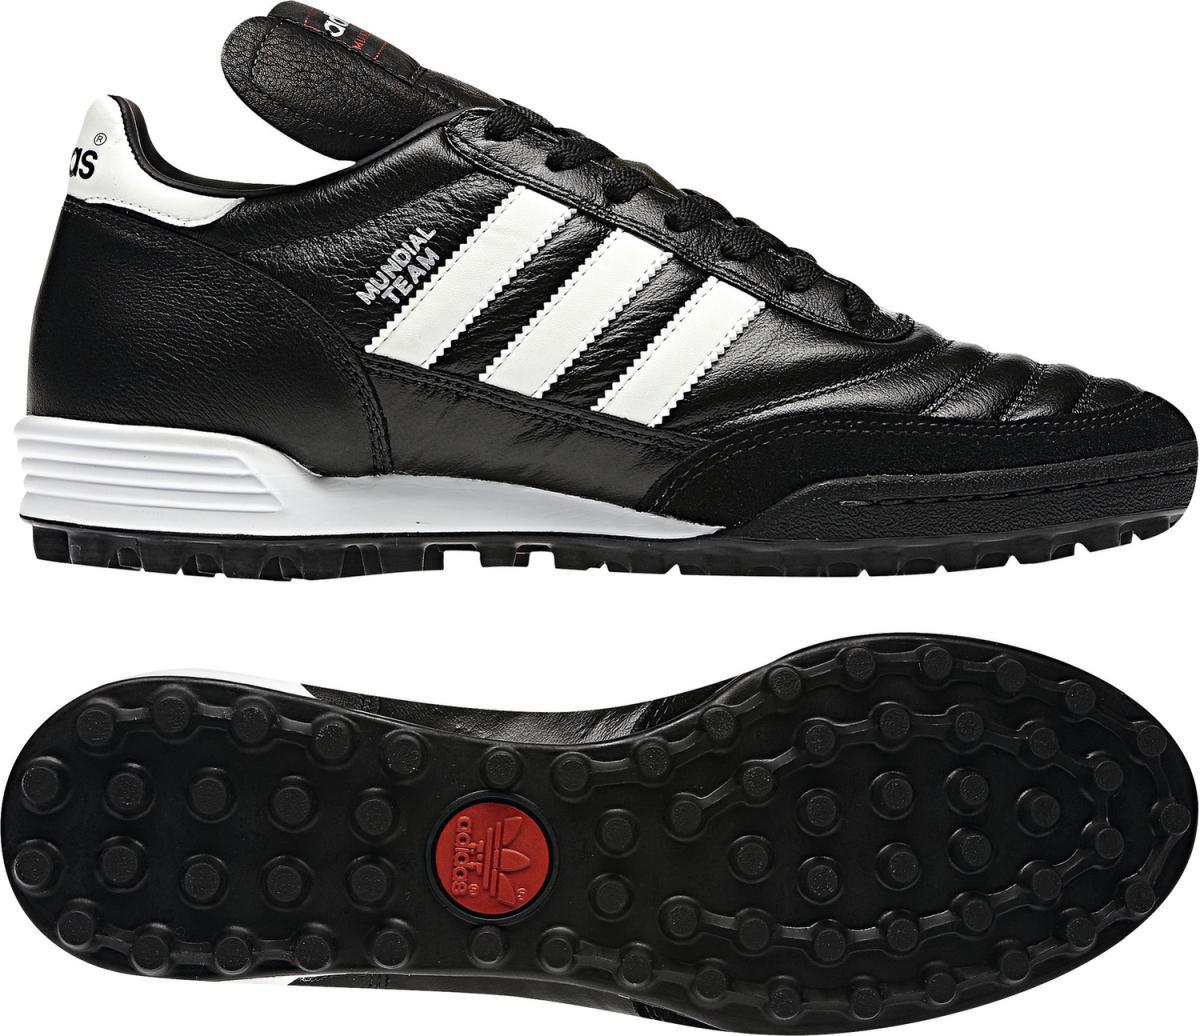 on sale 524b4 c47b0 Adidas Mundial Team TF black white im Preisvergleich auf Preis.de